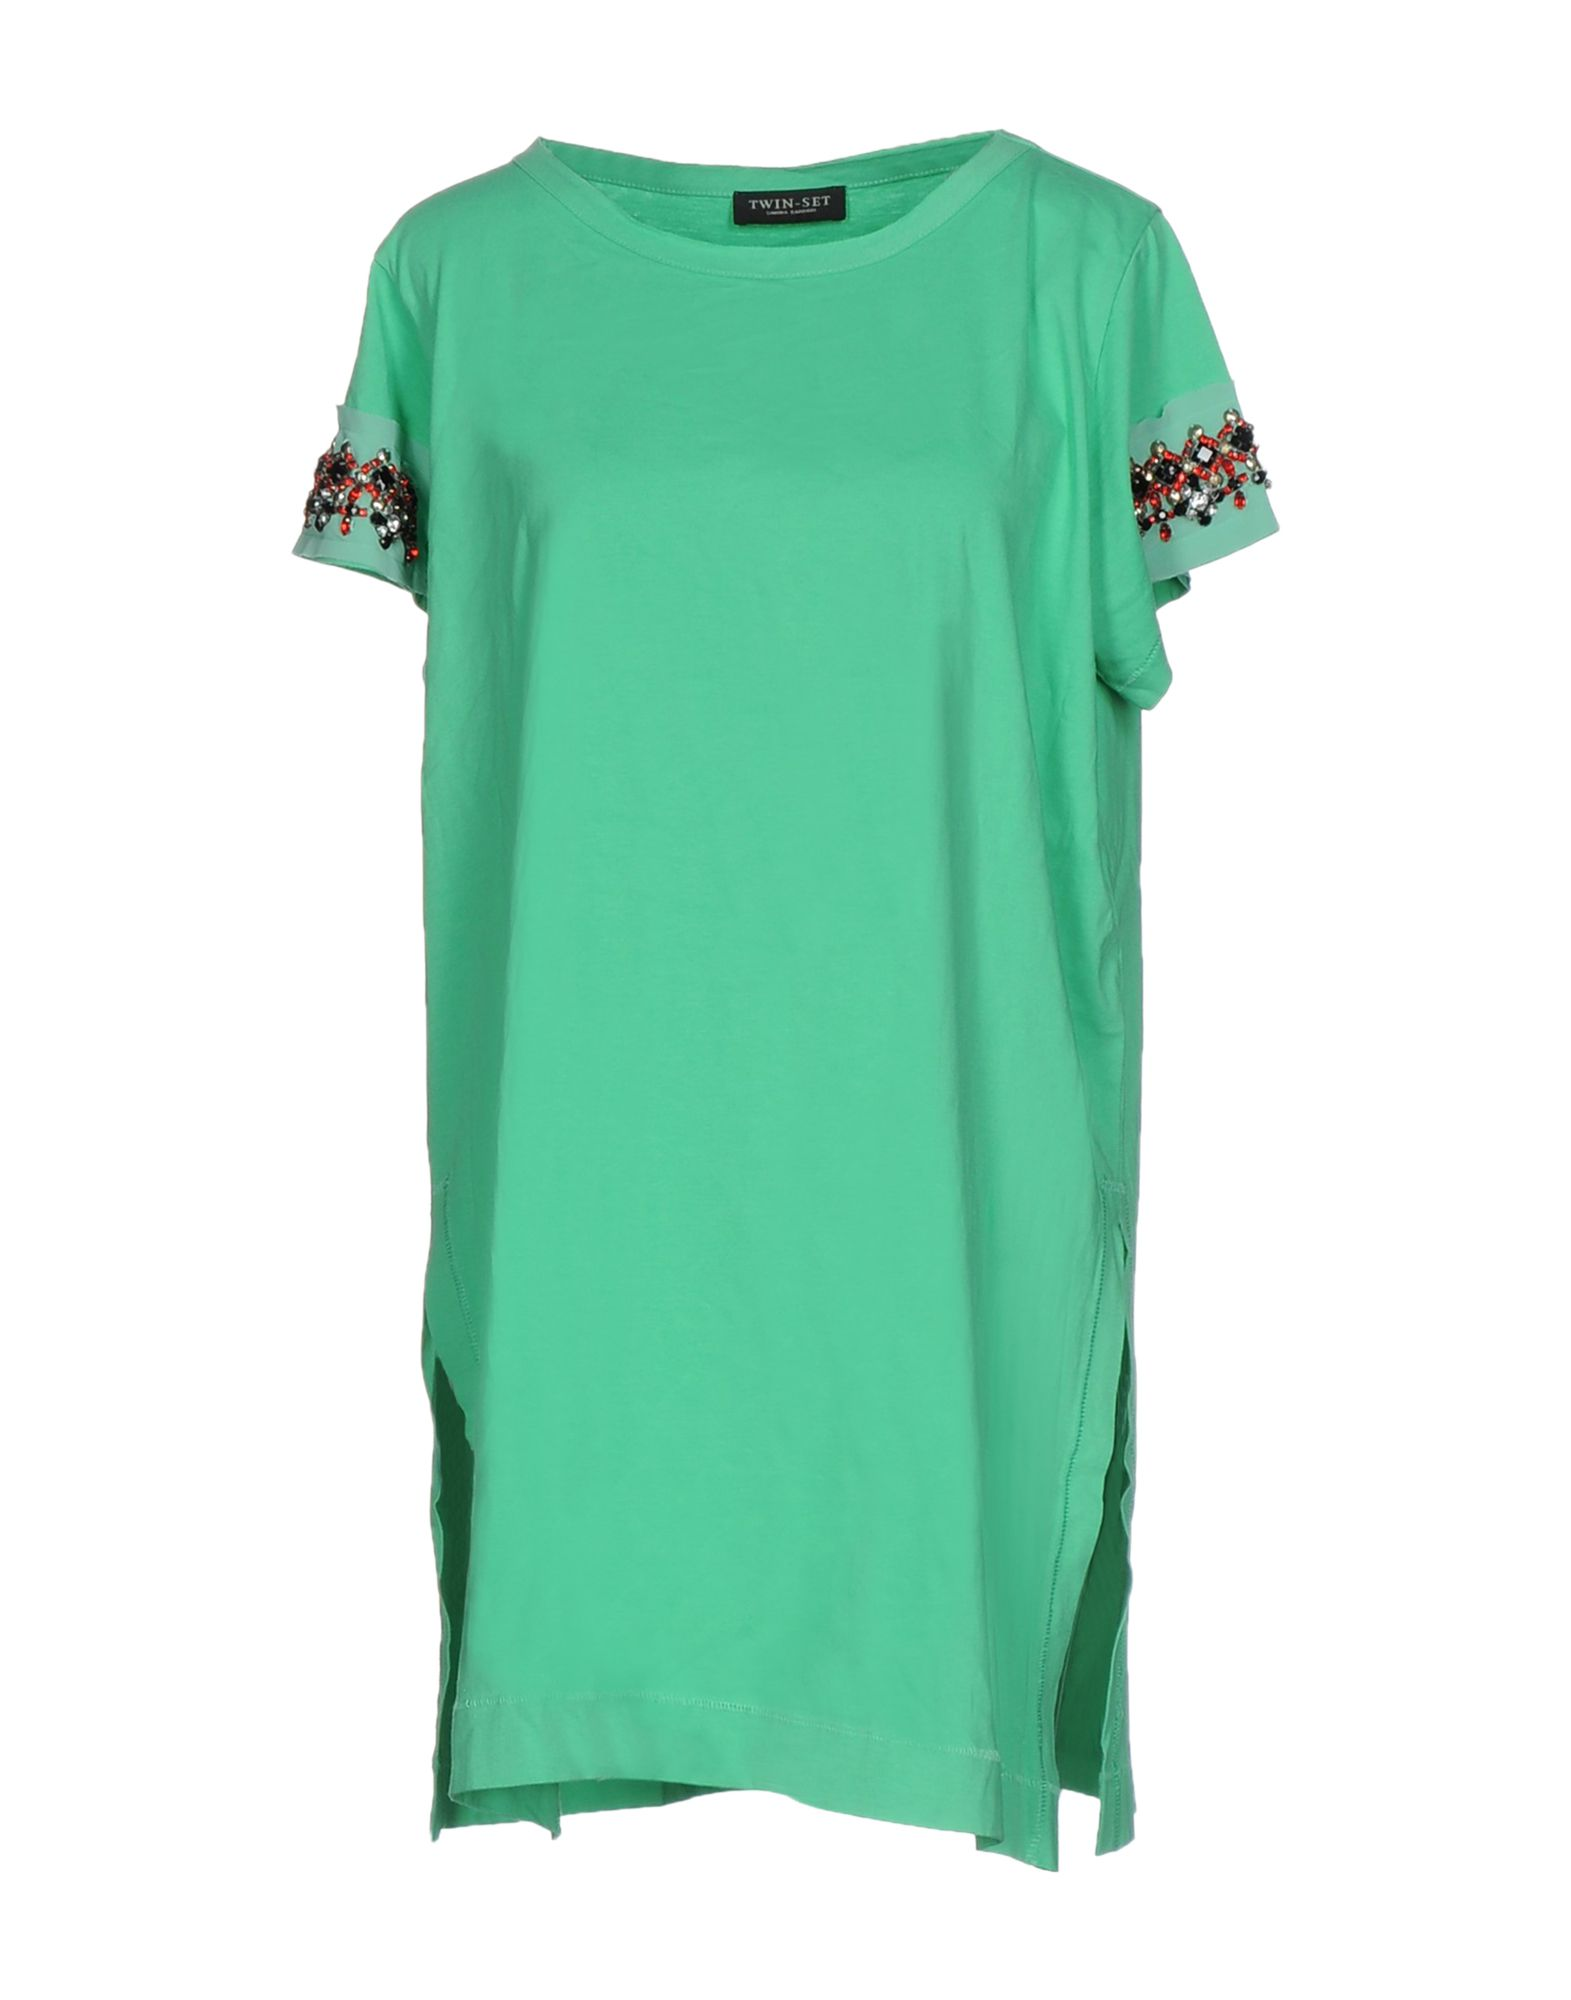 TWIN-SET Simona Barbieri Футболка twin set футболка с кружевом twin set j2a4fb 1014 кремовый m